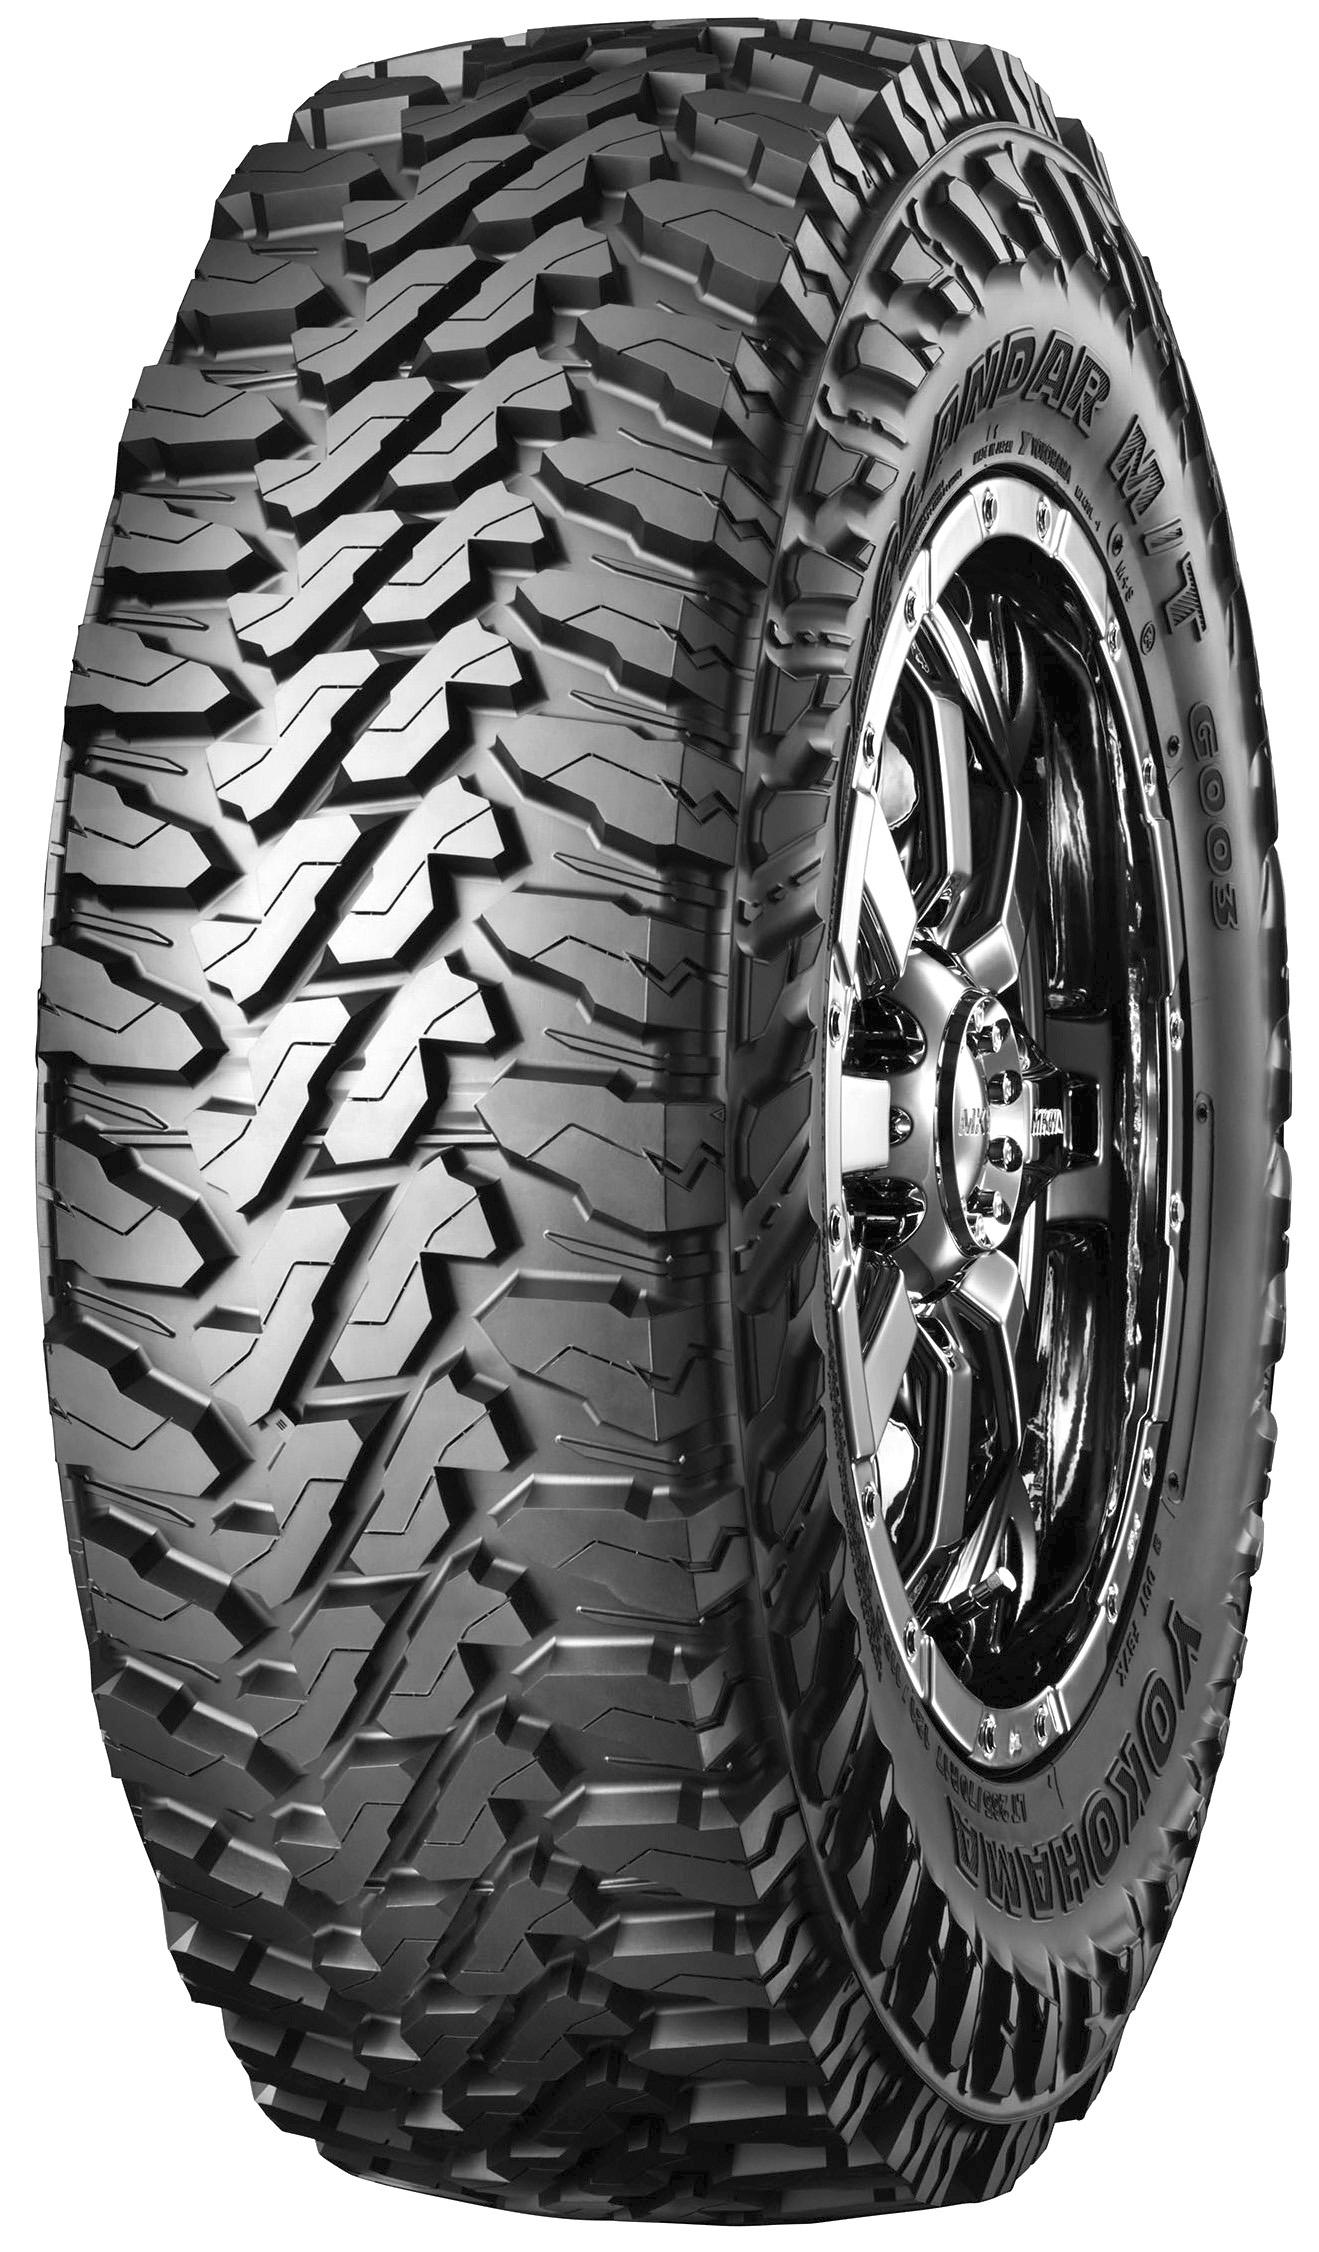 yokohama pneu tout terrain pour 4x4 et pick up am today